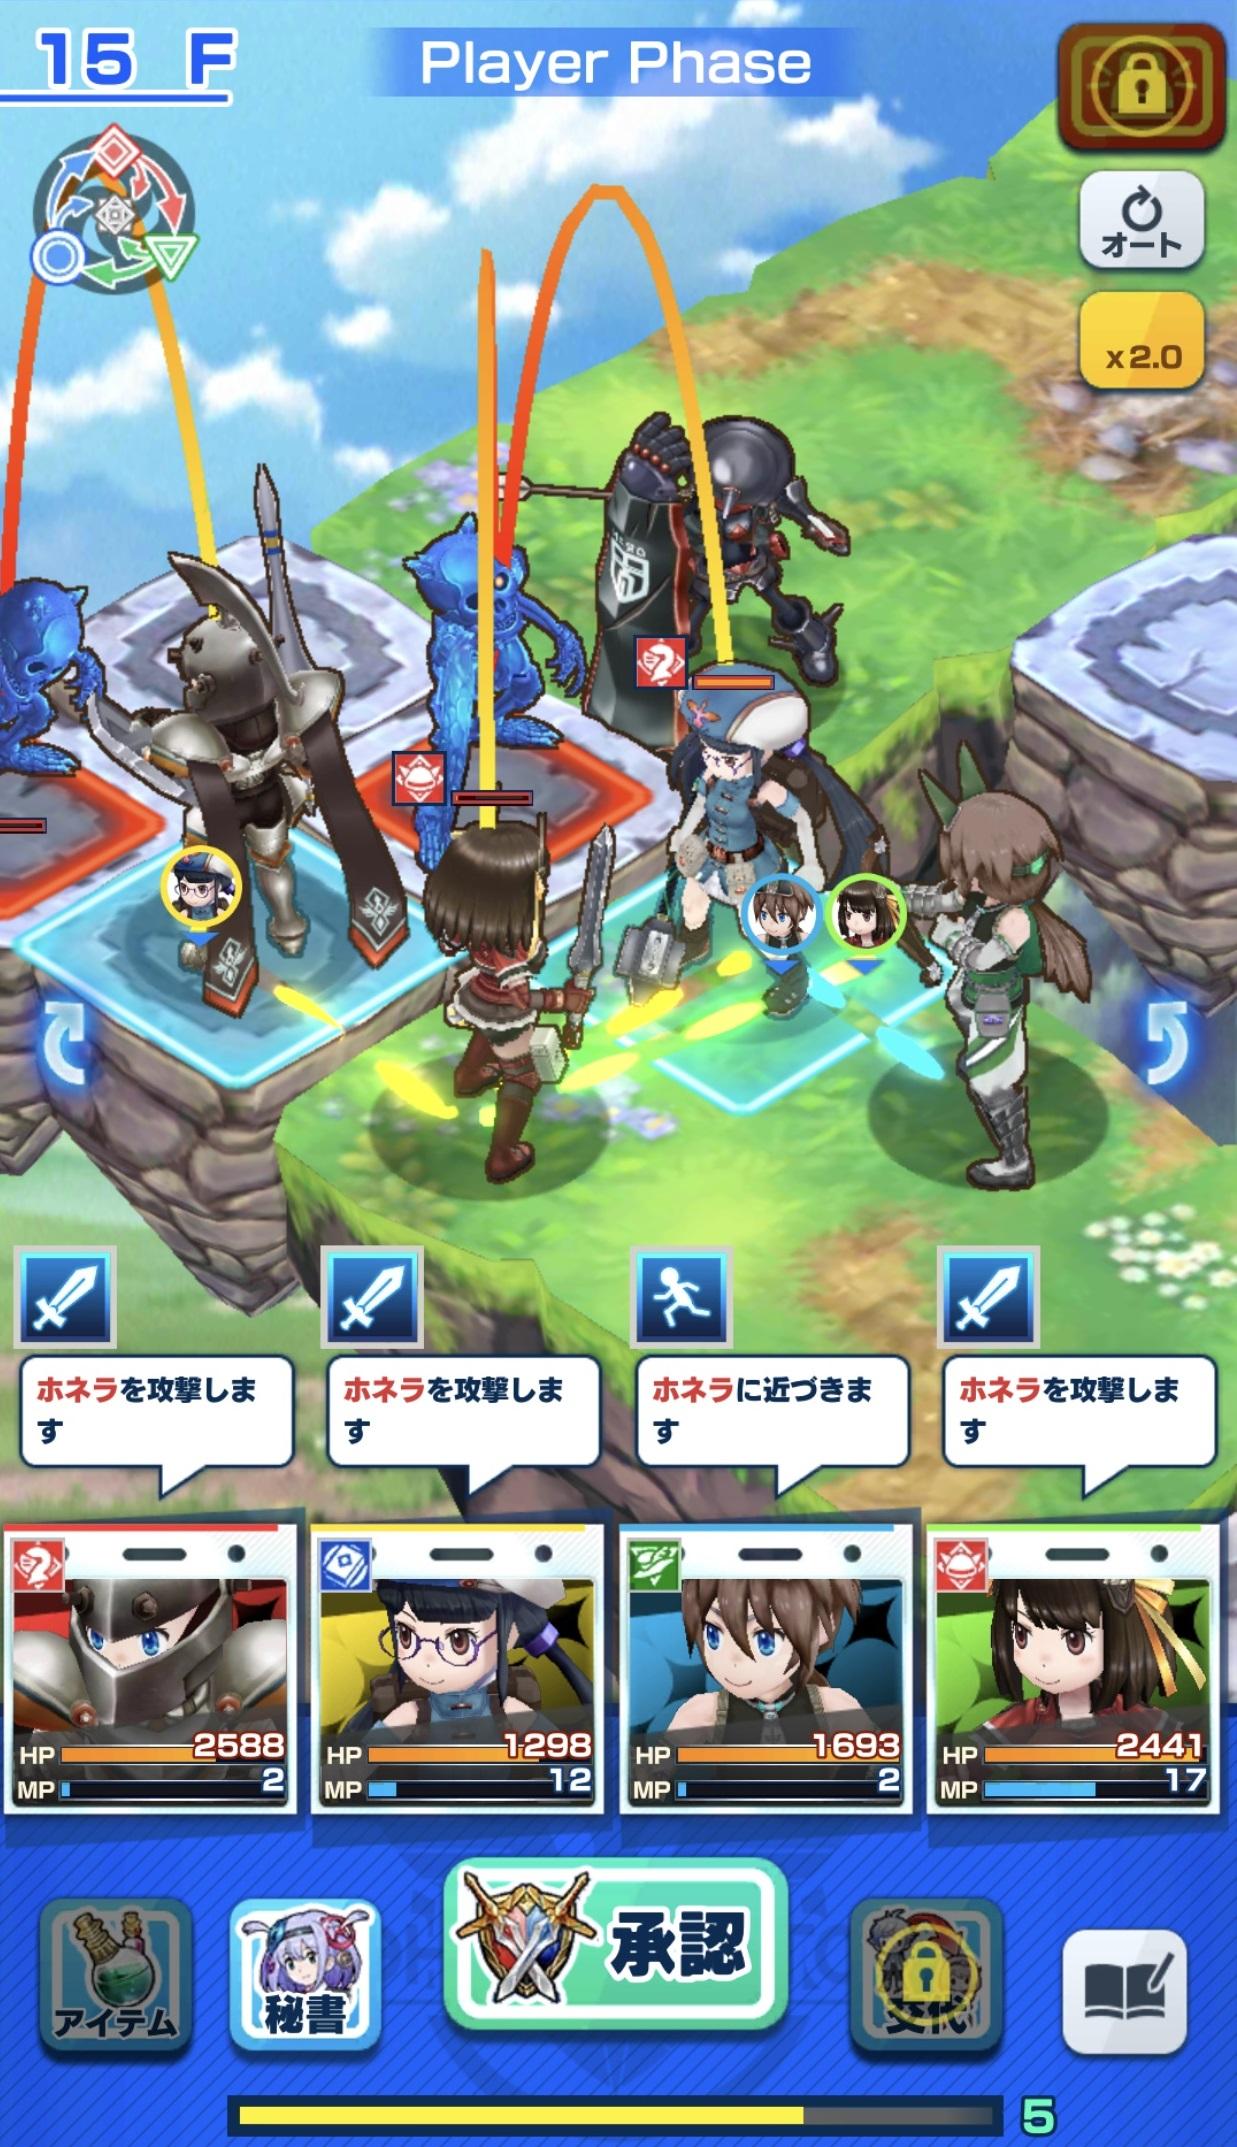 /theme/dengekionline/shachibato/images/system/Battle_01